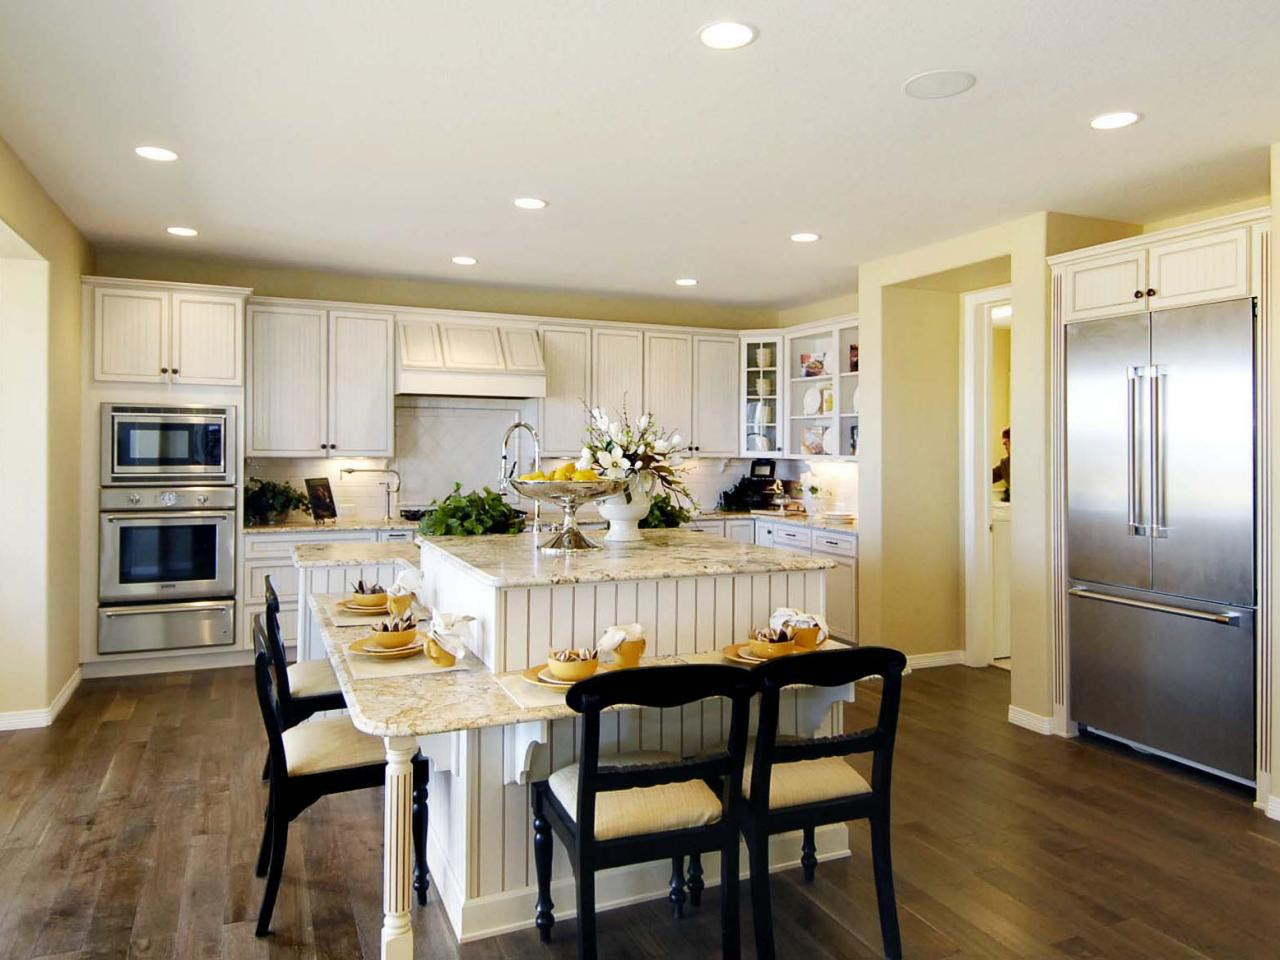 Kitchen Island Design Ideas: Pictures, Options & Tips | HGTV